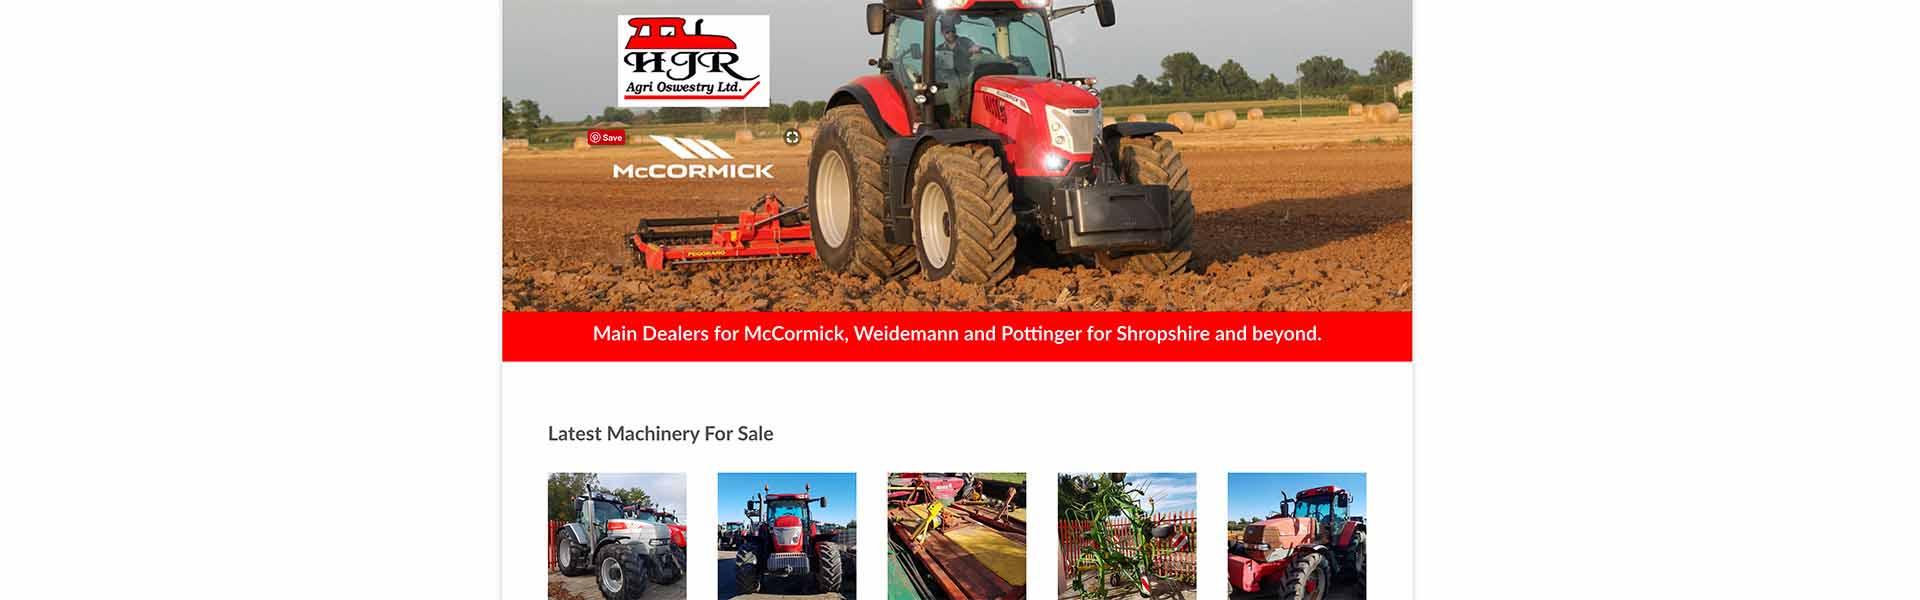 Web Design UK Portfolio HJR Agri